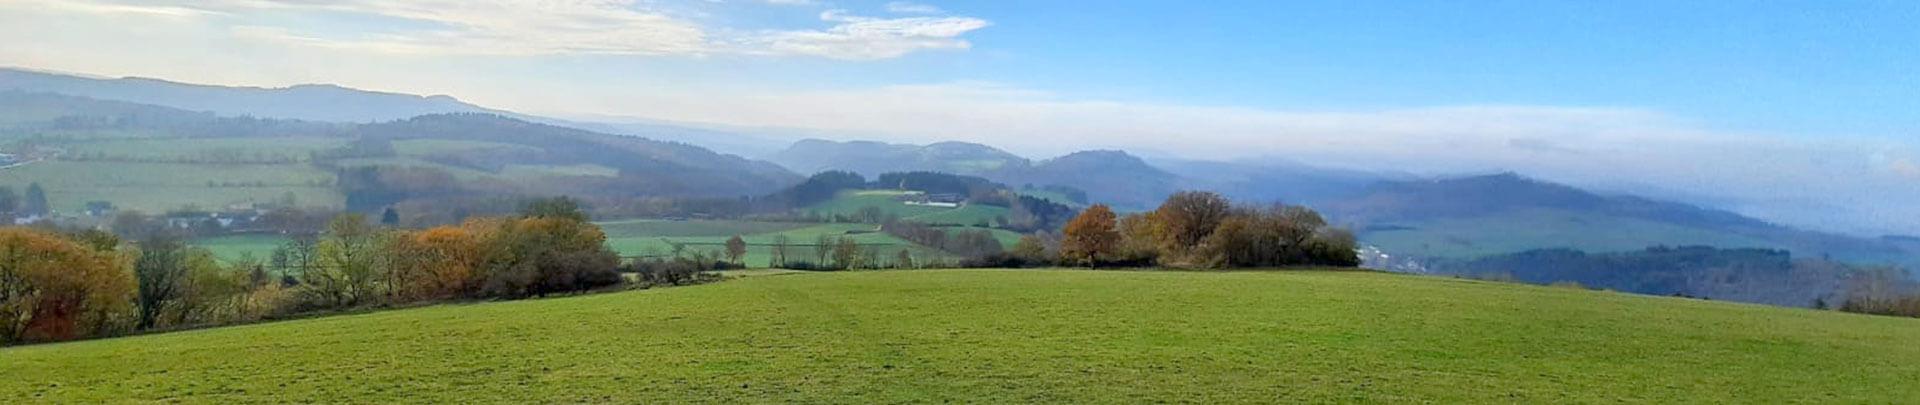 Regionale Landschaft